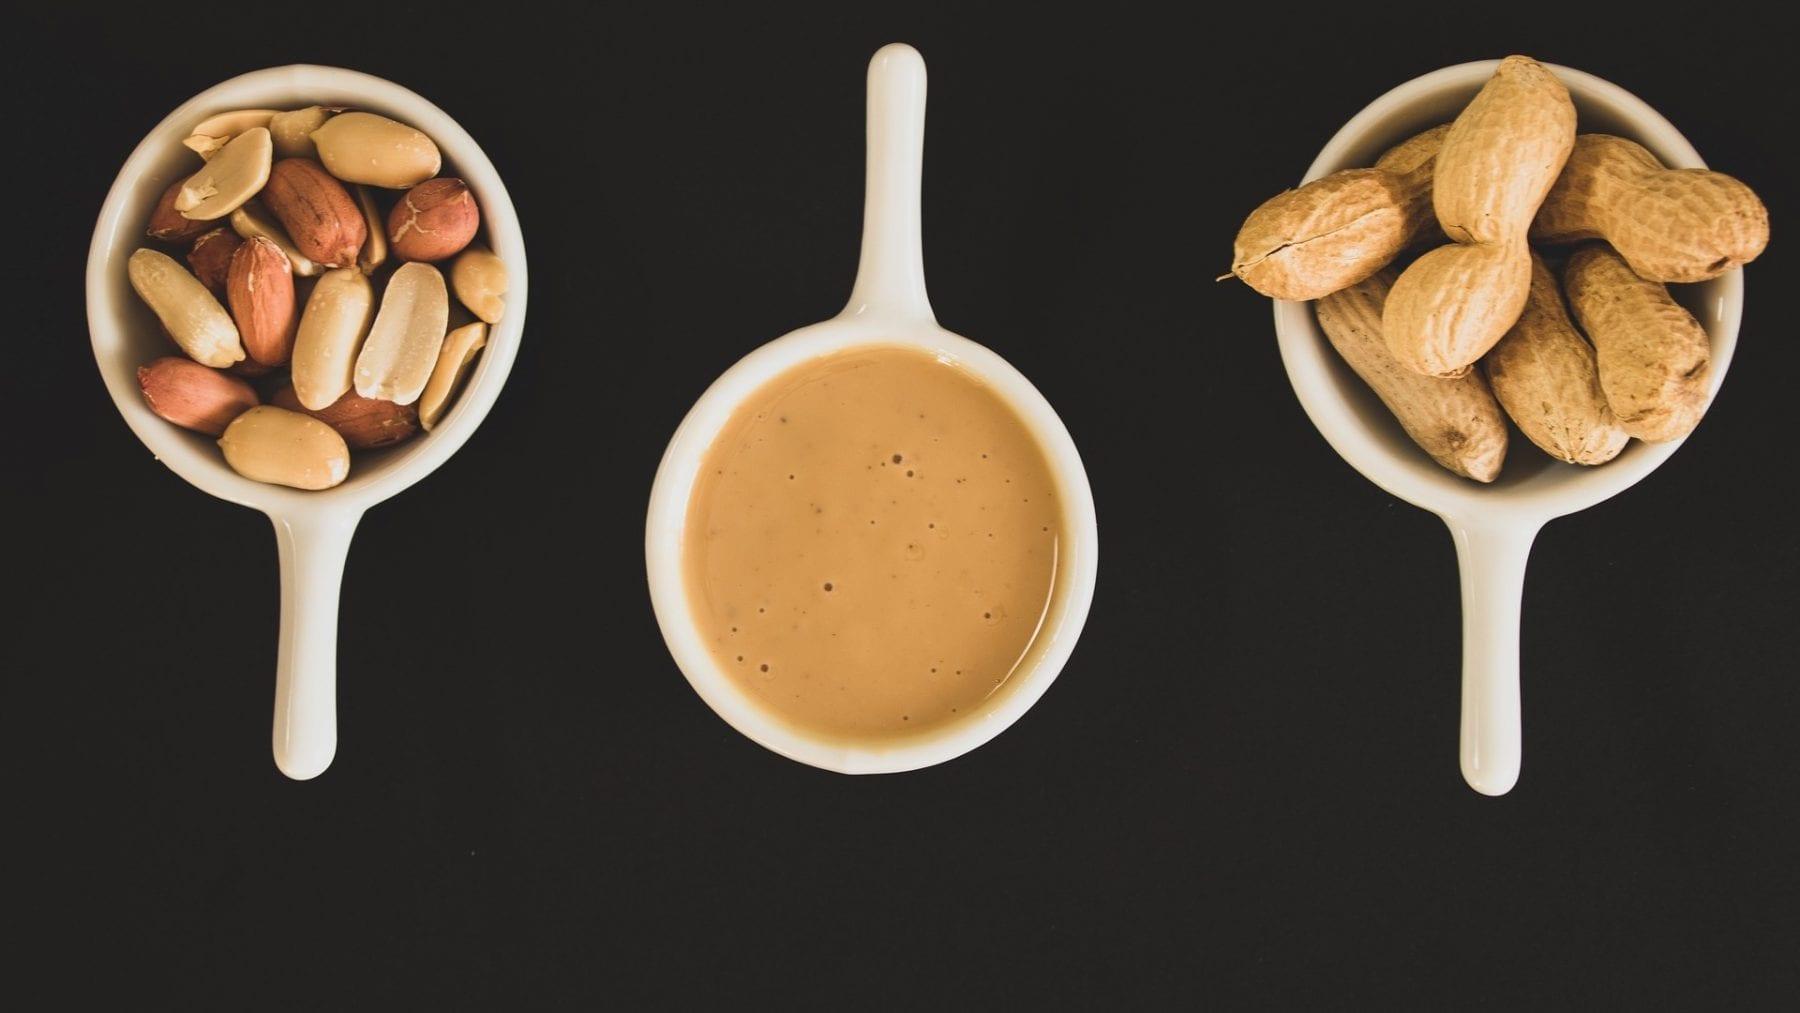 Peanut butter fedt